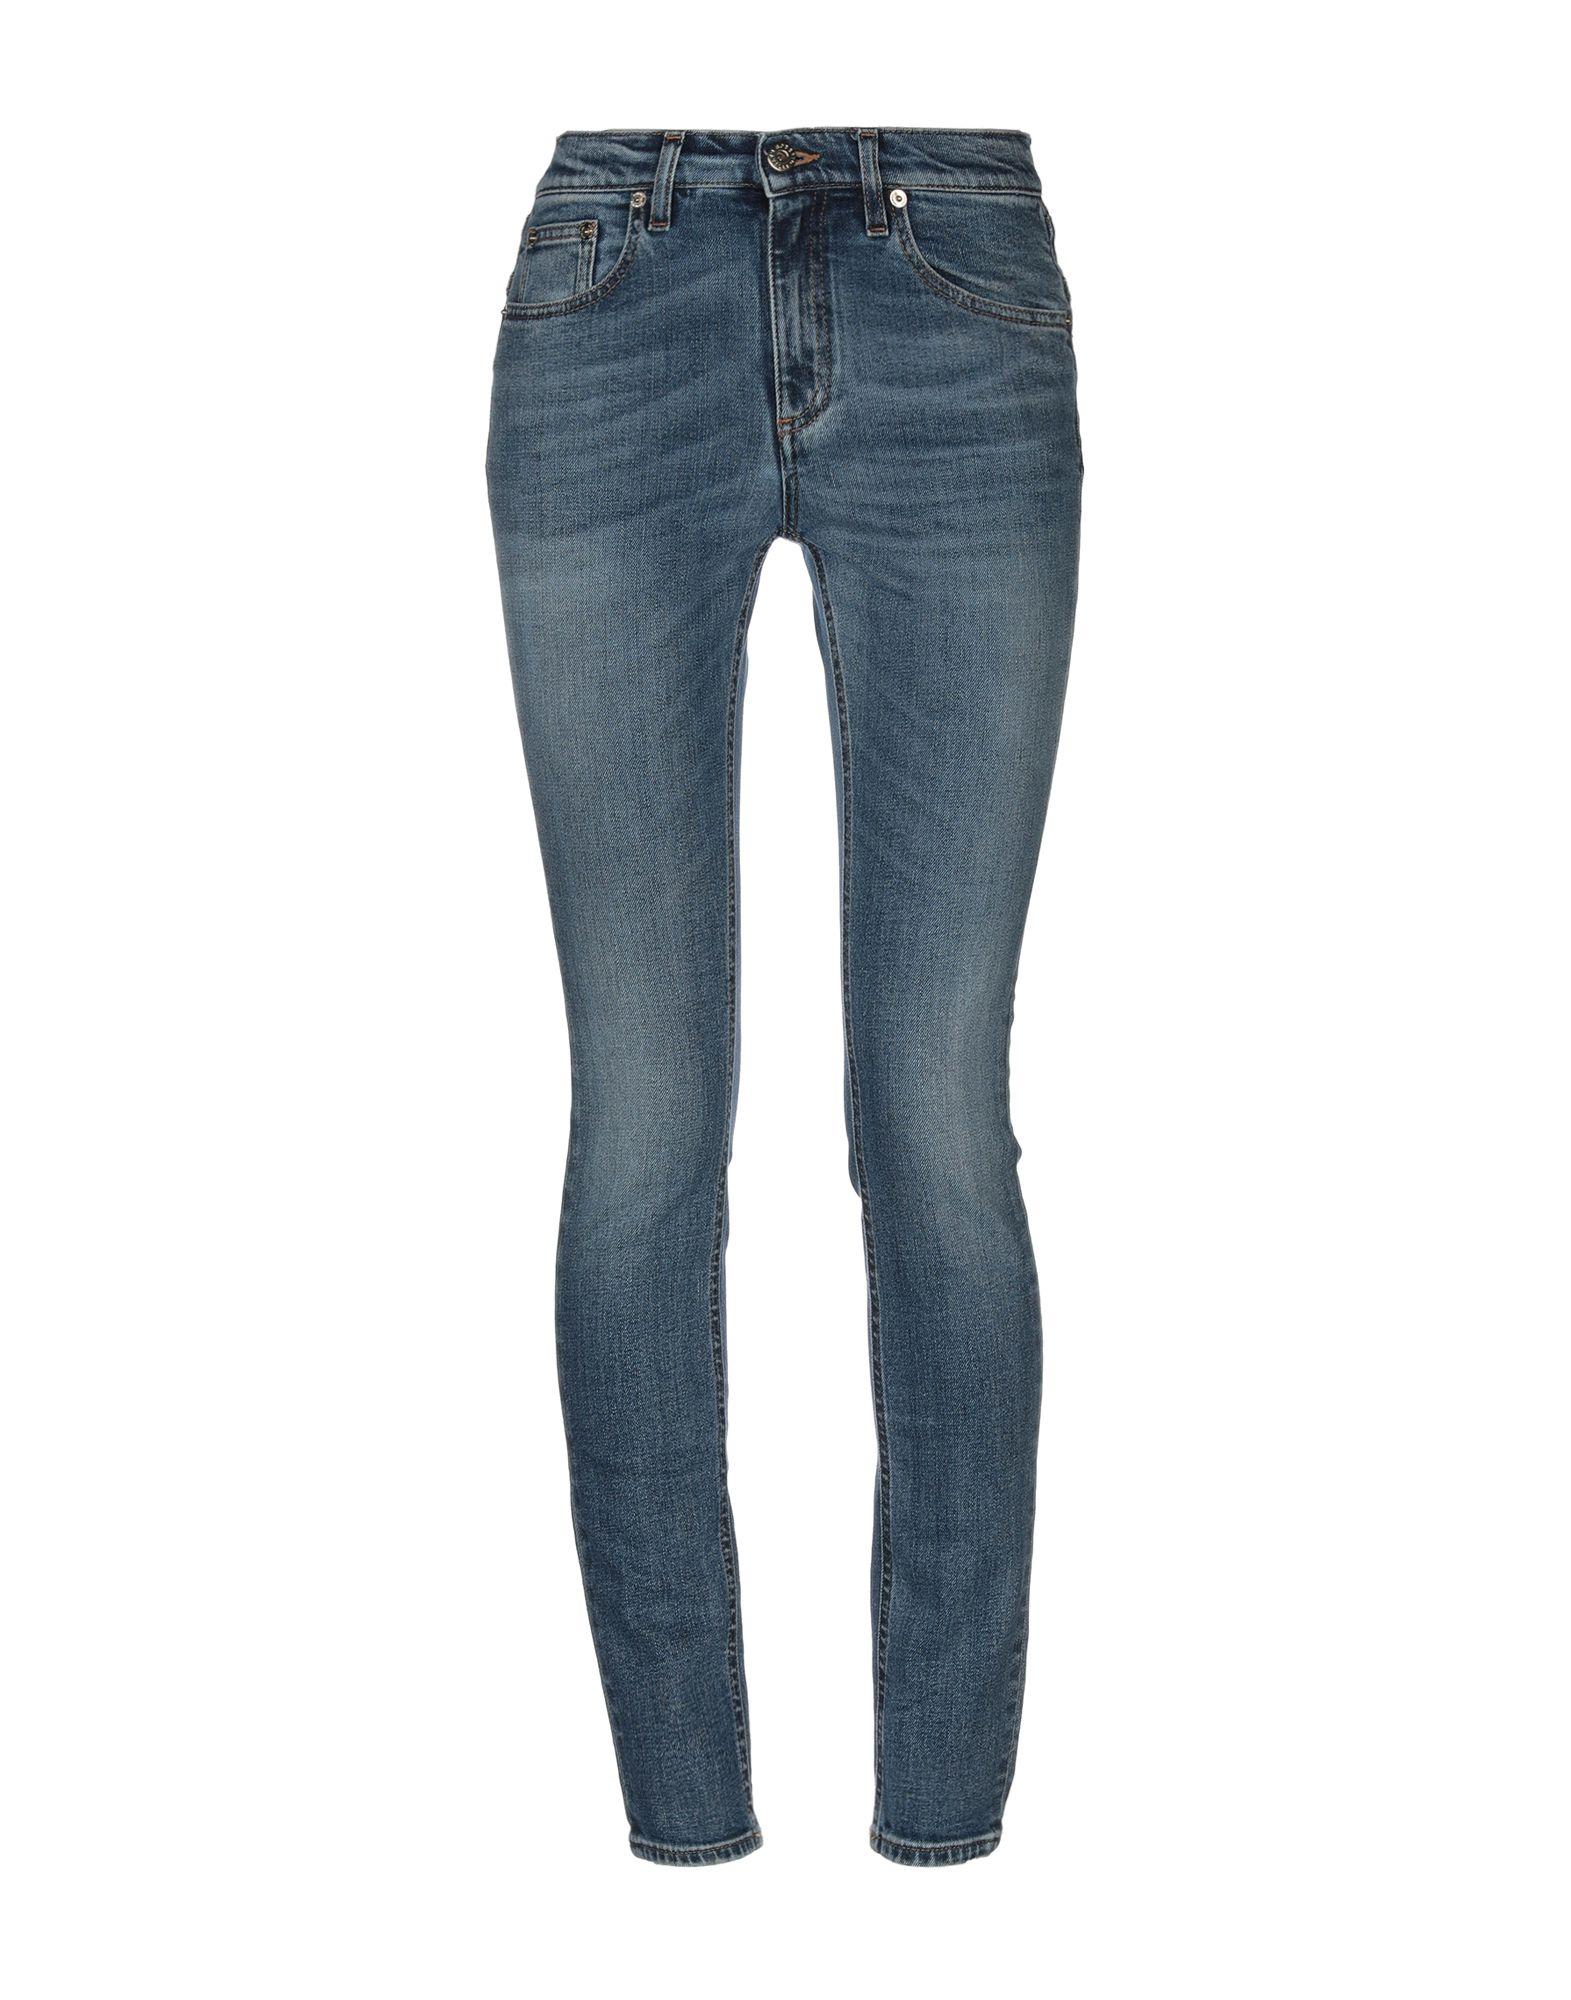 Roberto Cavalli Jeans And Denim - Roberto Cavalli Women - YOOX United States 457a9e03538